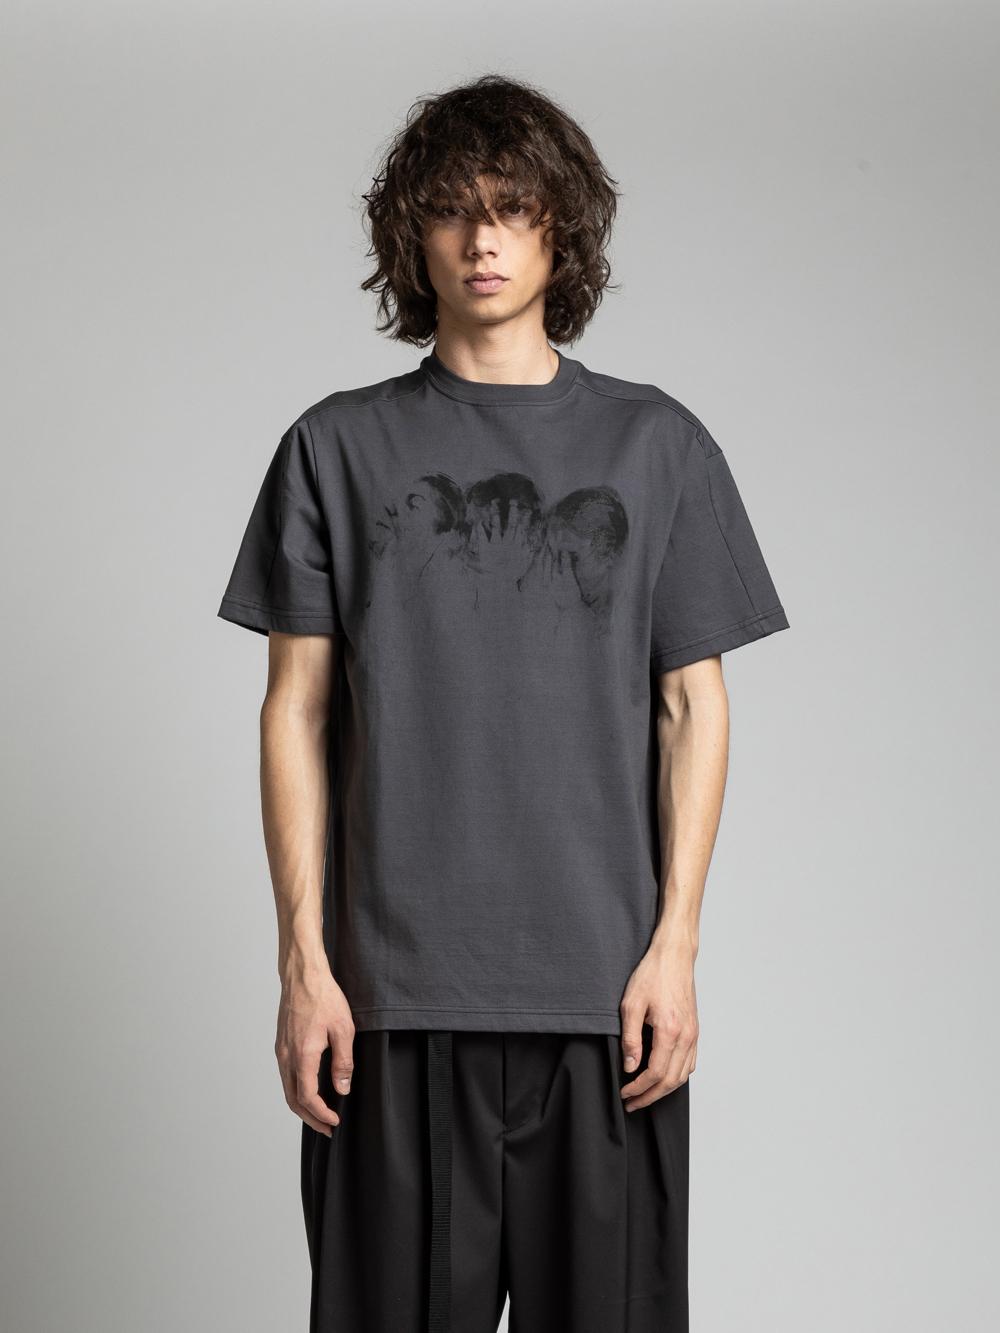 VI-PM-013-01 / PATRICIA MARCH コラボレーション プリント 半袖Tシャツ